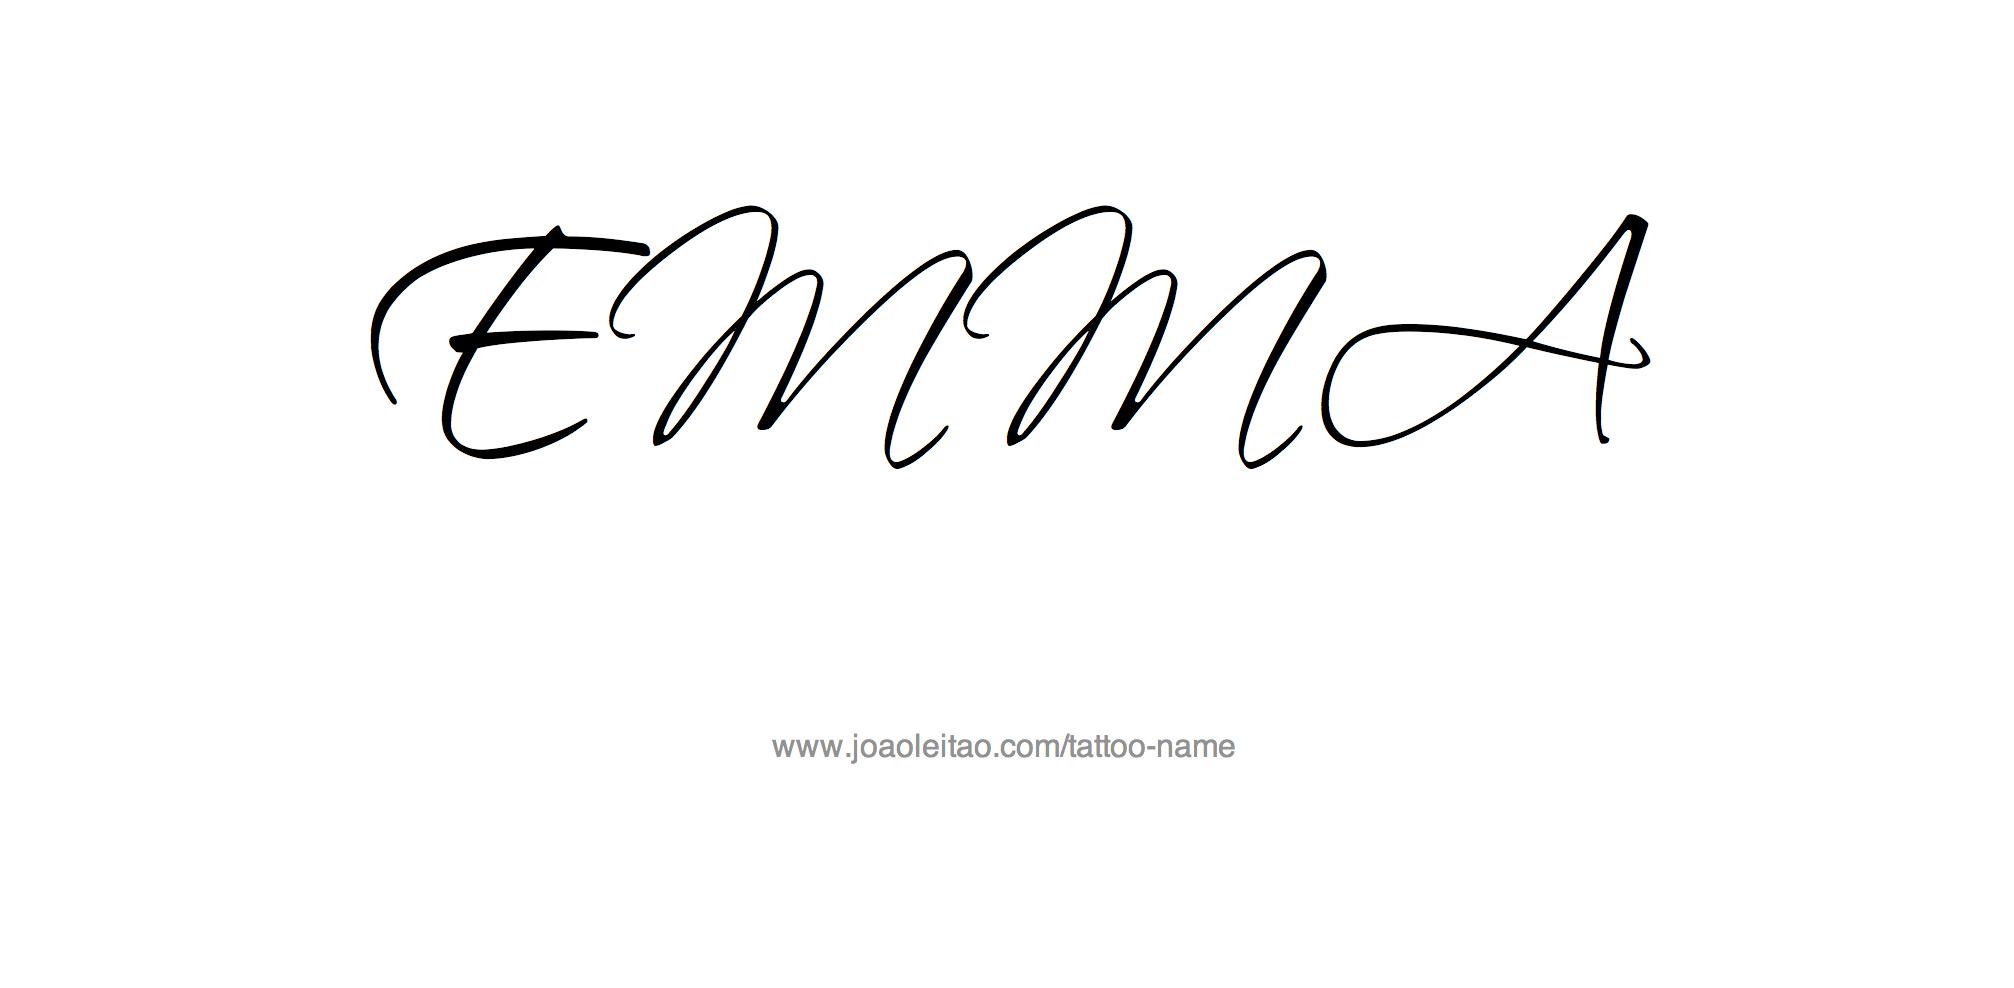 Tattoo name writing designs emma name tattoo designs  abbies room  pinterest  tattoos tattoo